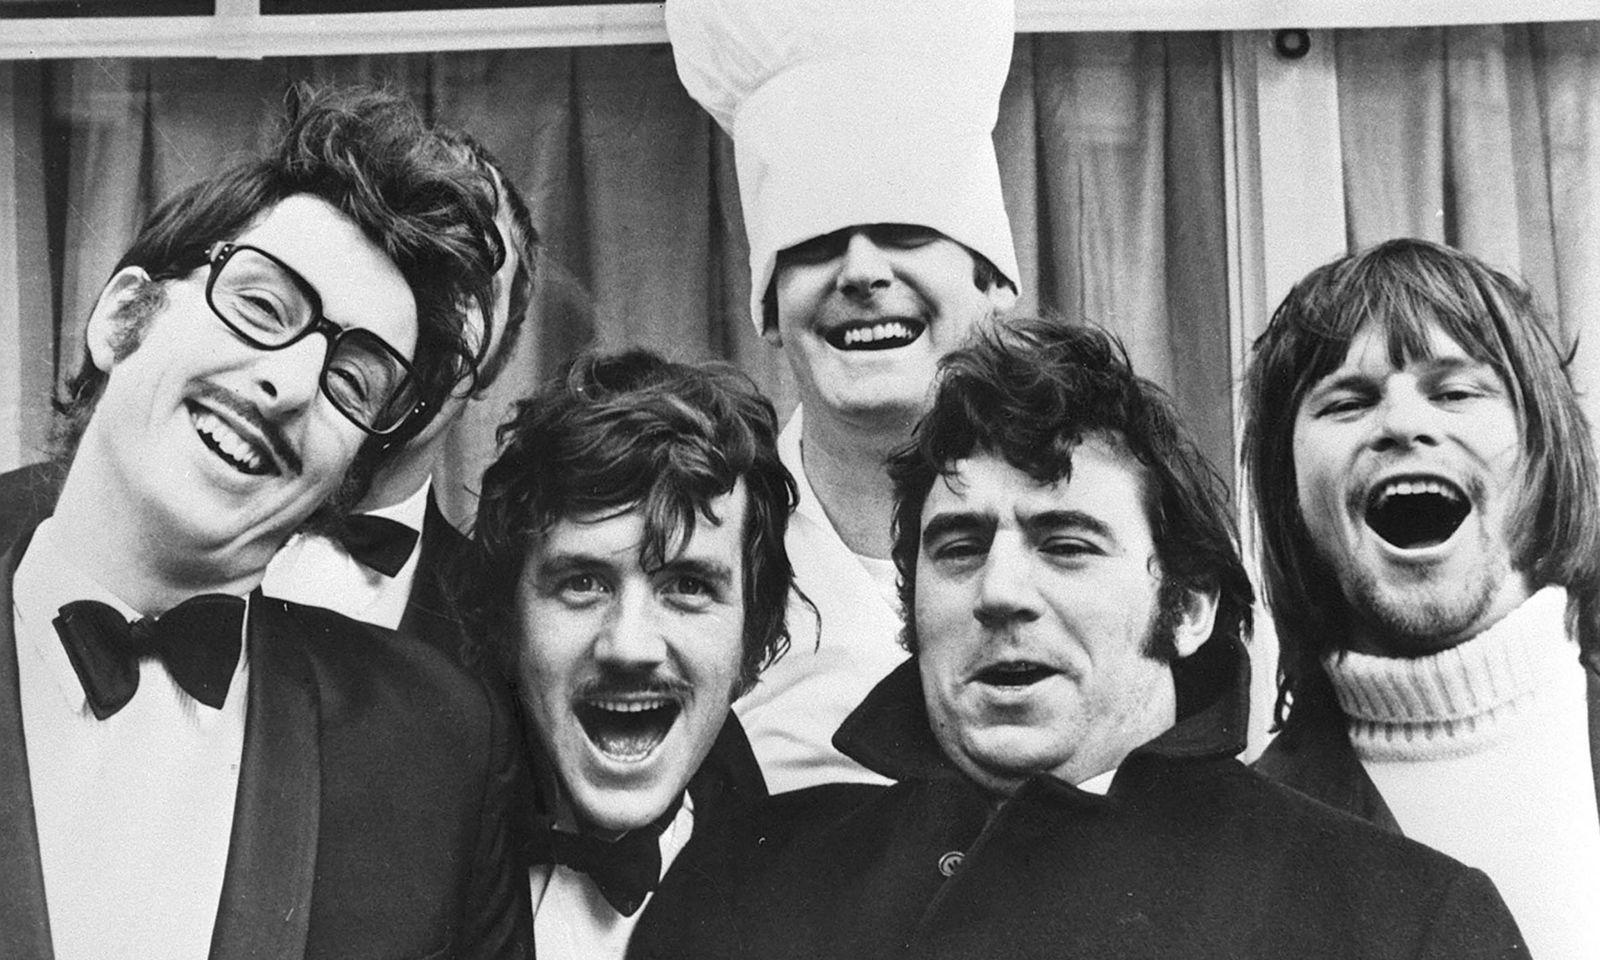 Die Monty-Python-Truppe: Foto vlnr.: ERIC IDLE, MICHAEL PALIN, JOHN CLEESE, TERRY JONES, TERRY GILLIAM.